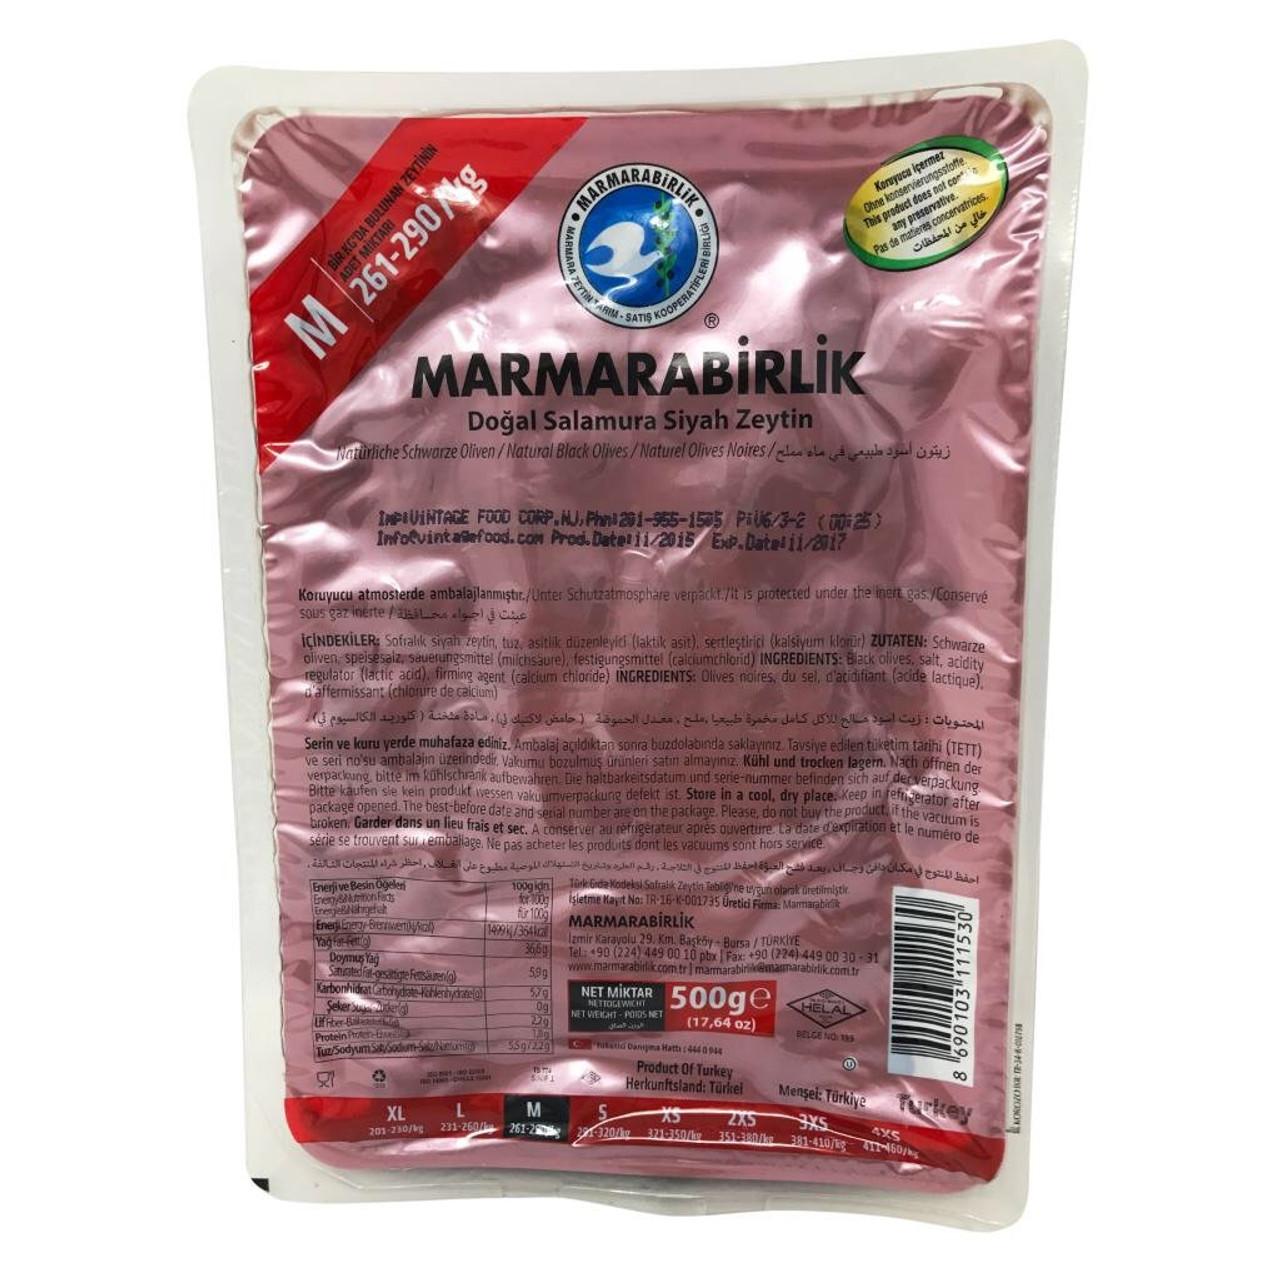 MARMARABIRLIK SUPER-GEMLIK (500G) Pinkish Pack (M)